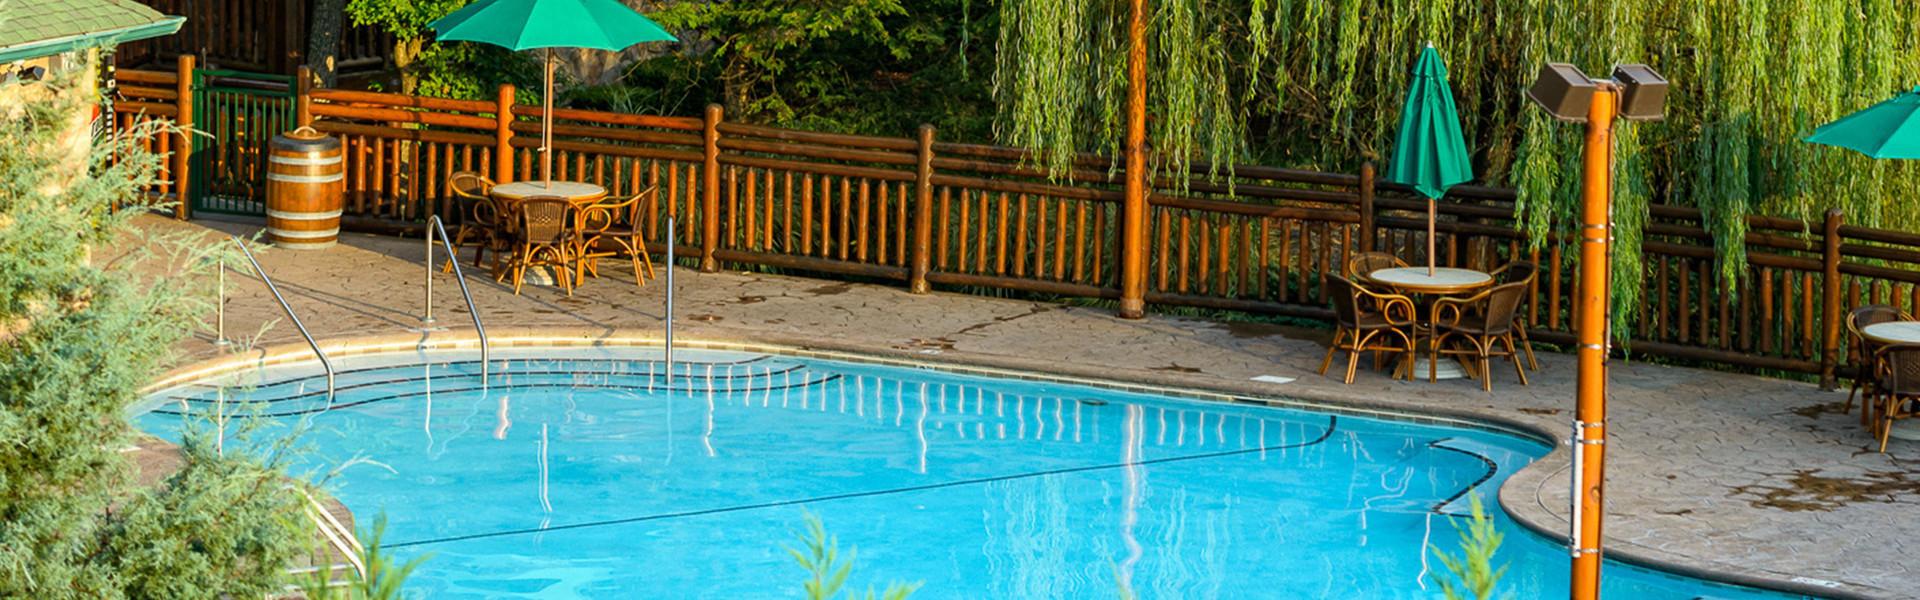 Heated Outdoor Pools and Spa Tubs Gatlinburg TN | Westgate Smoky Mountain Resort & Spa